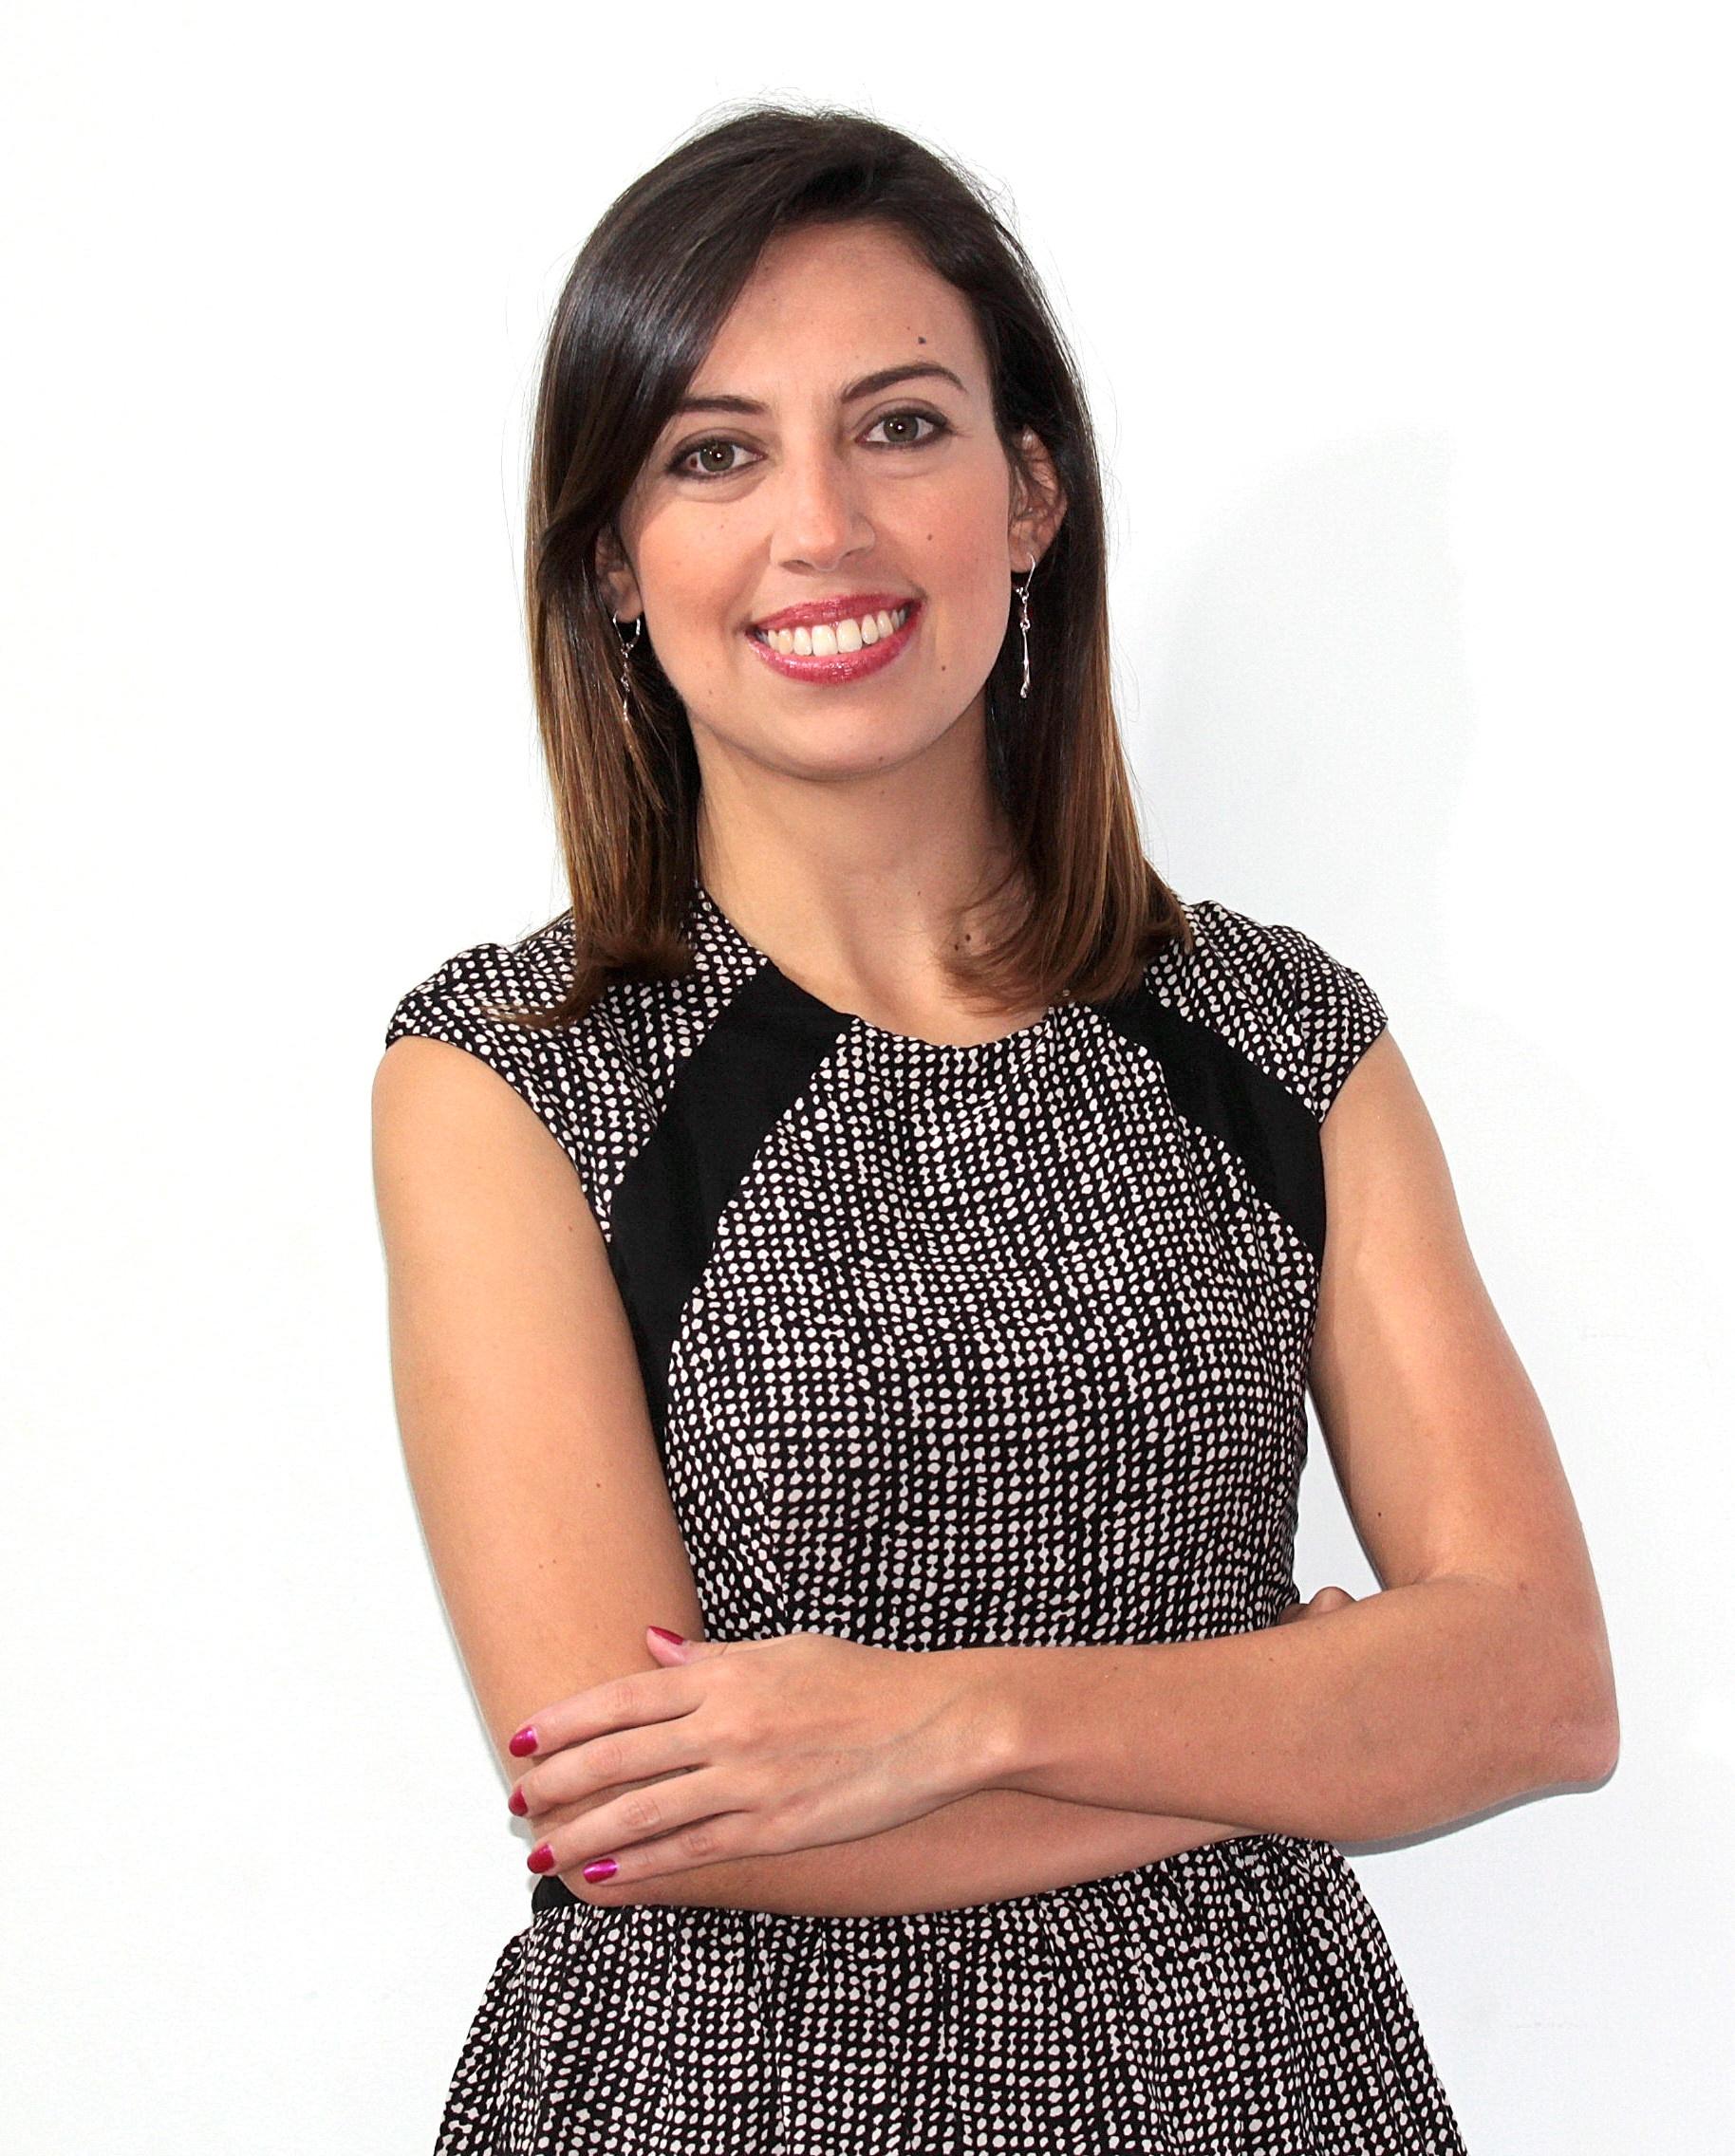 Sonia Gamboa